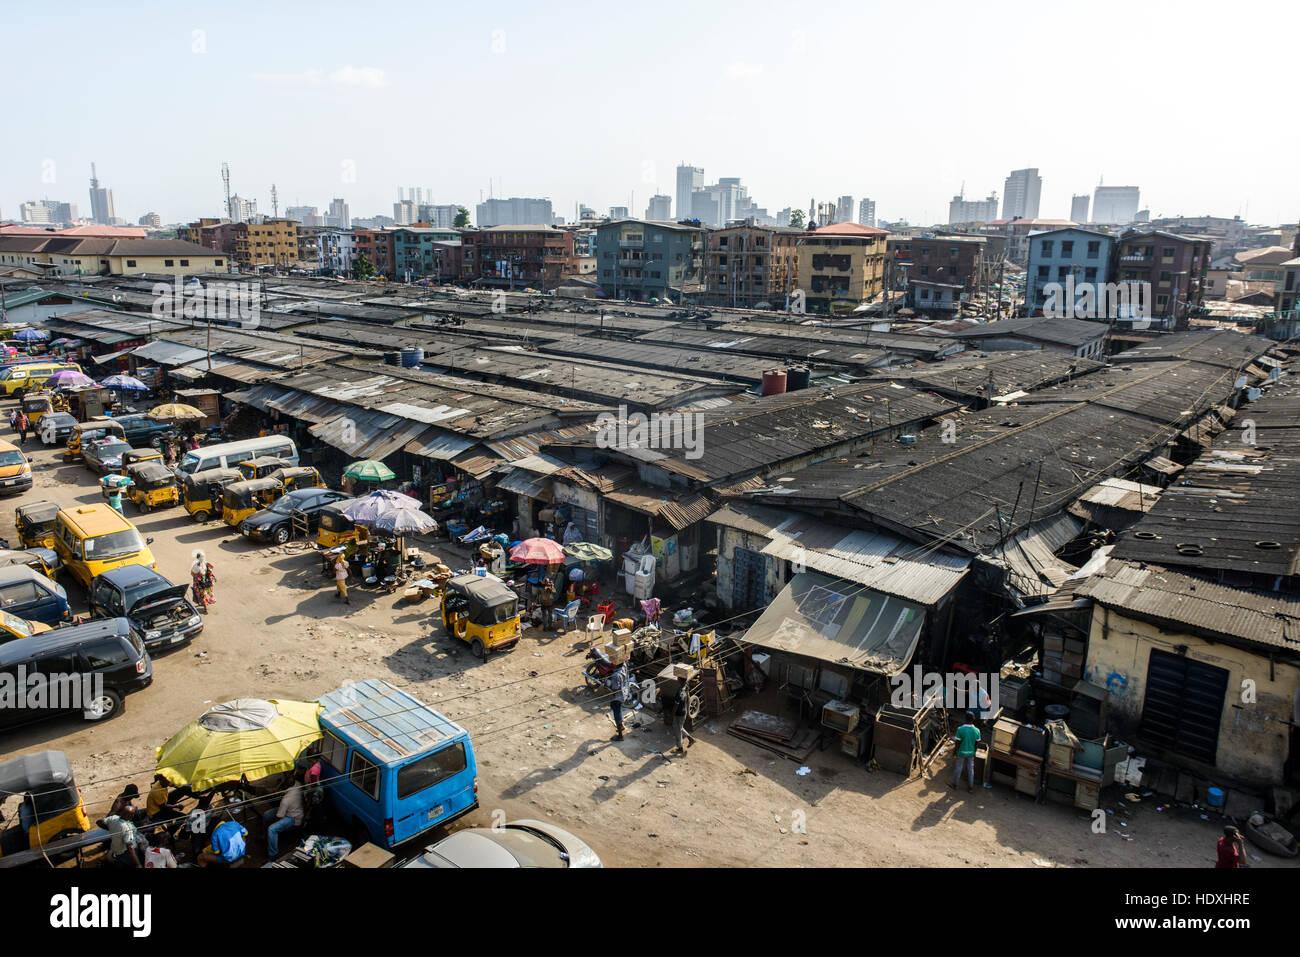 the floating slums of lagos nigeria stock photo 129047842 alamy